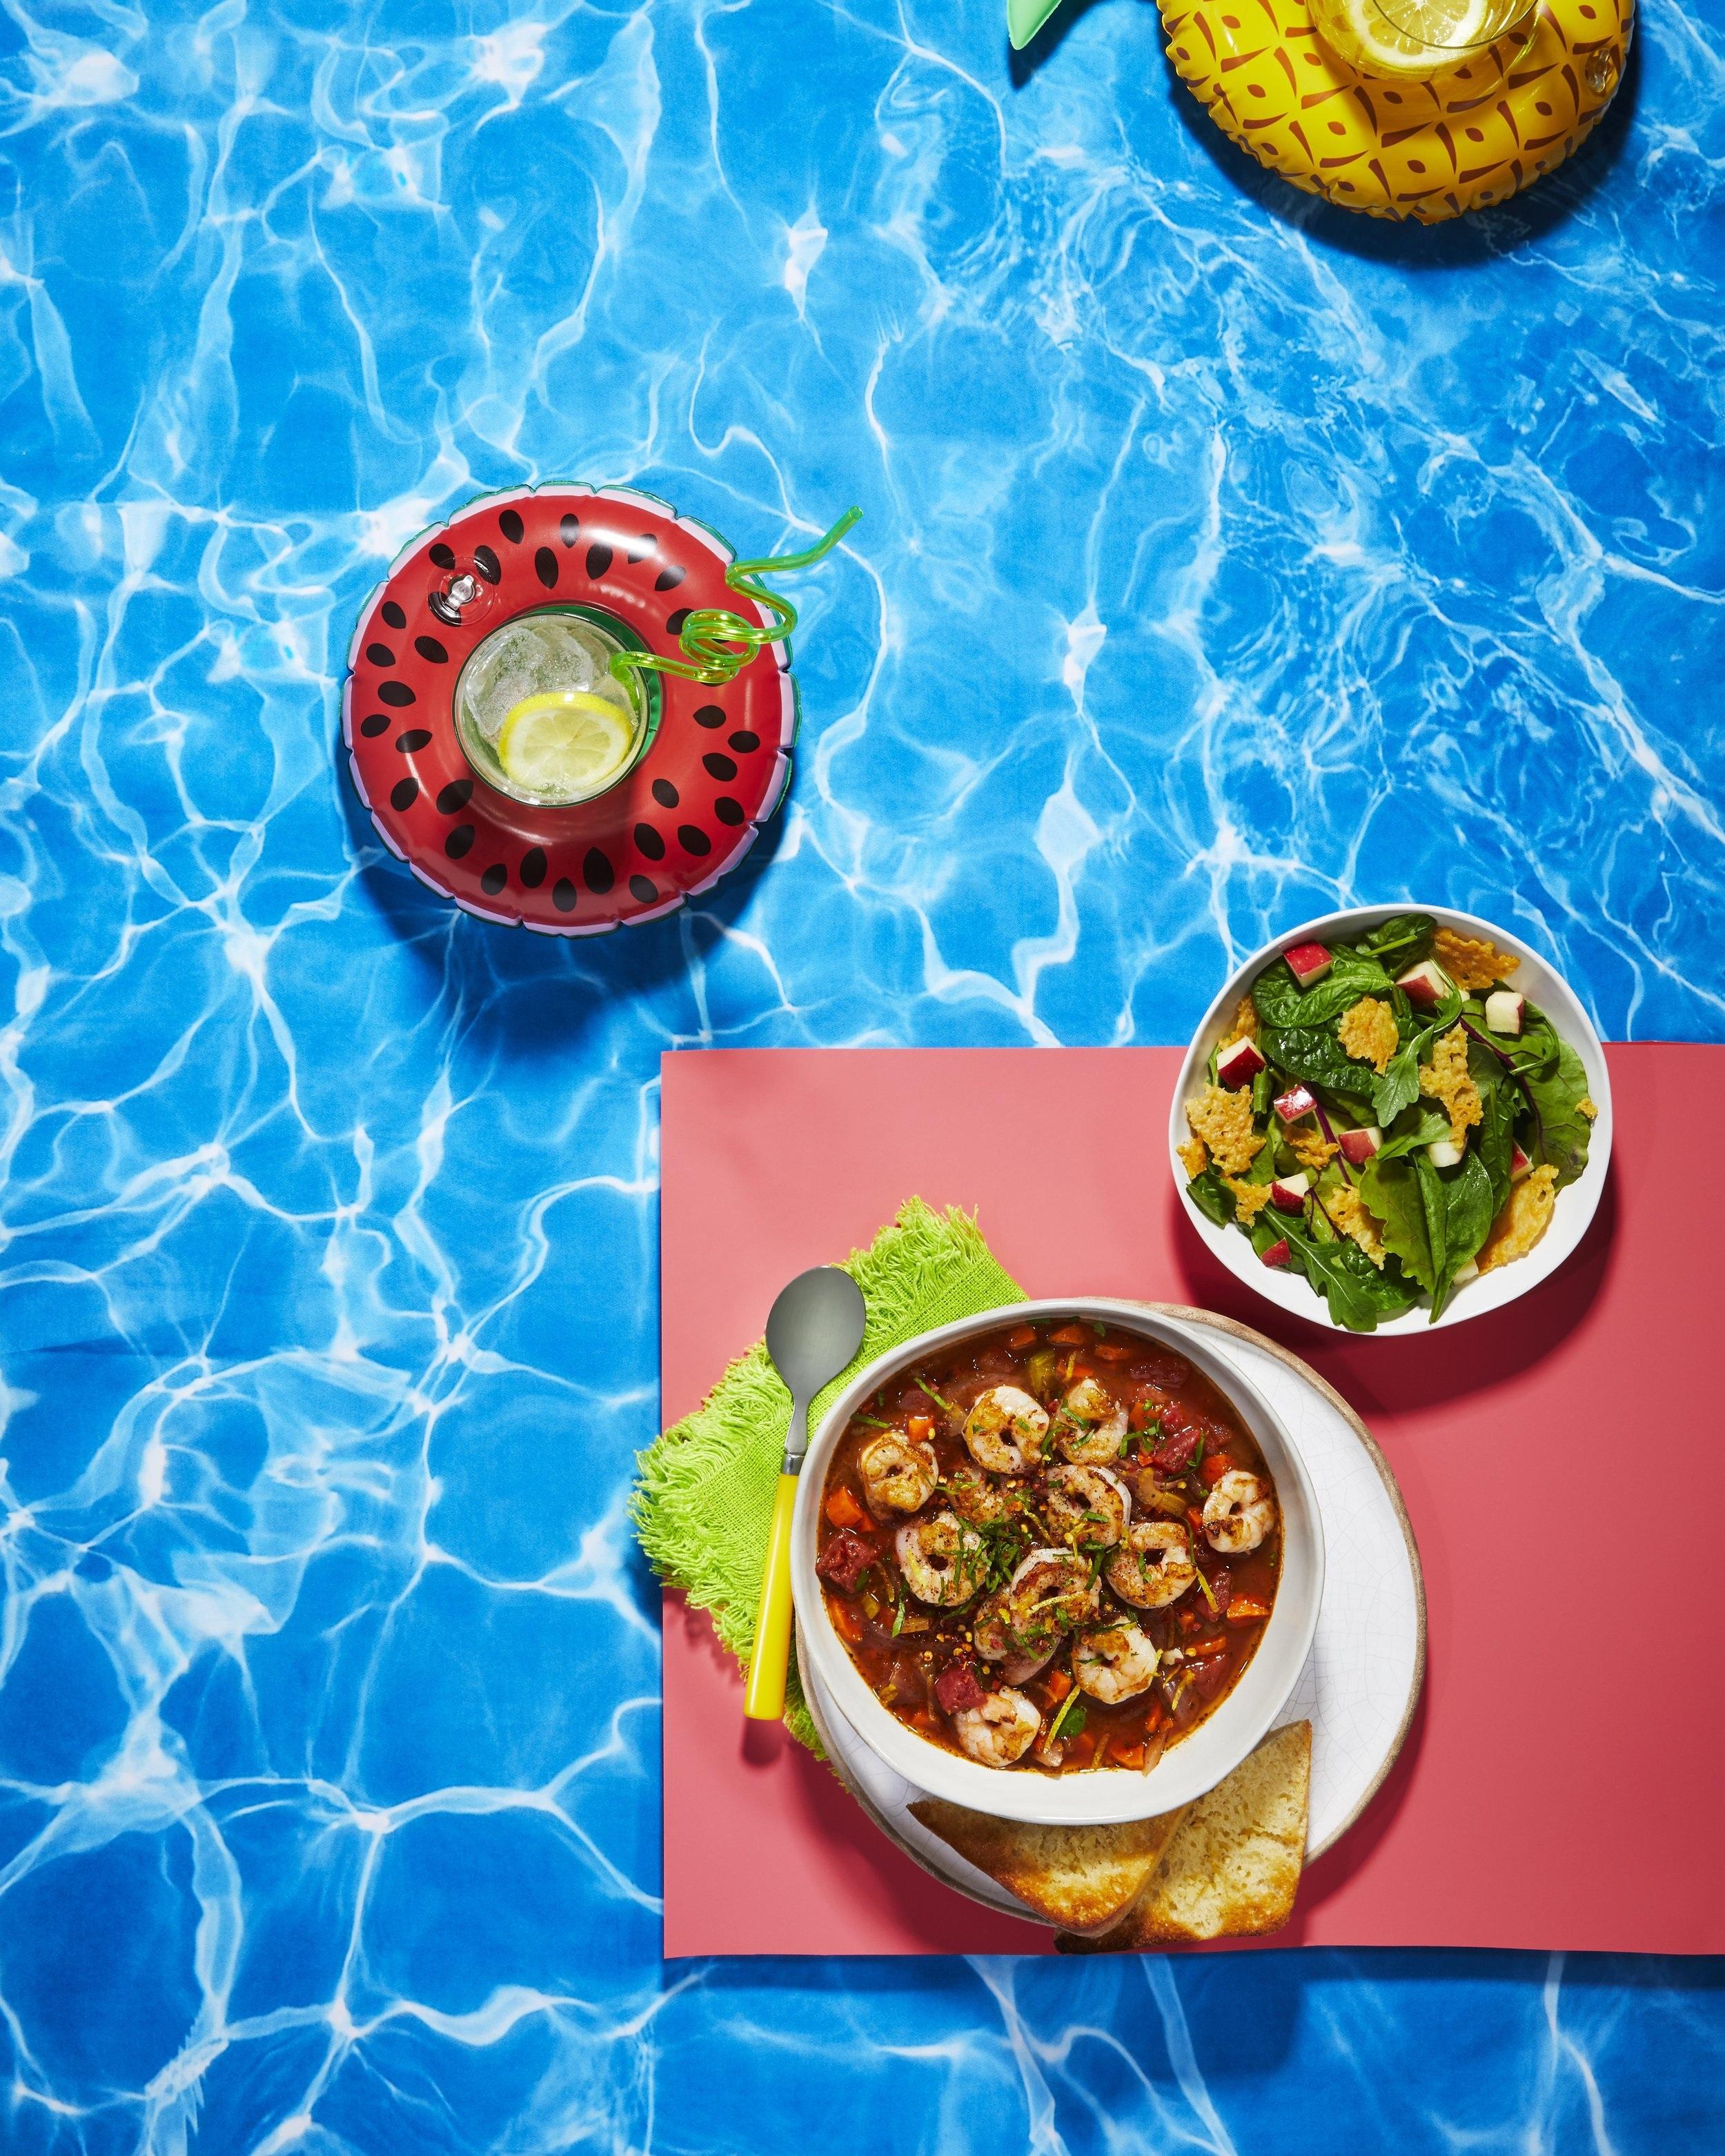 Pool_ShrimpCioppino copy.jpg